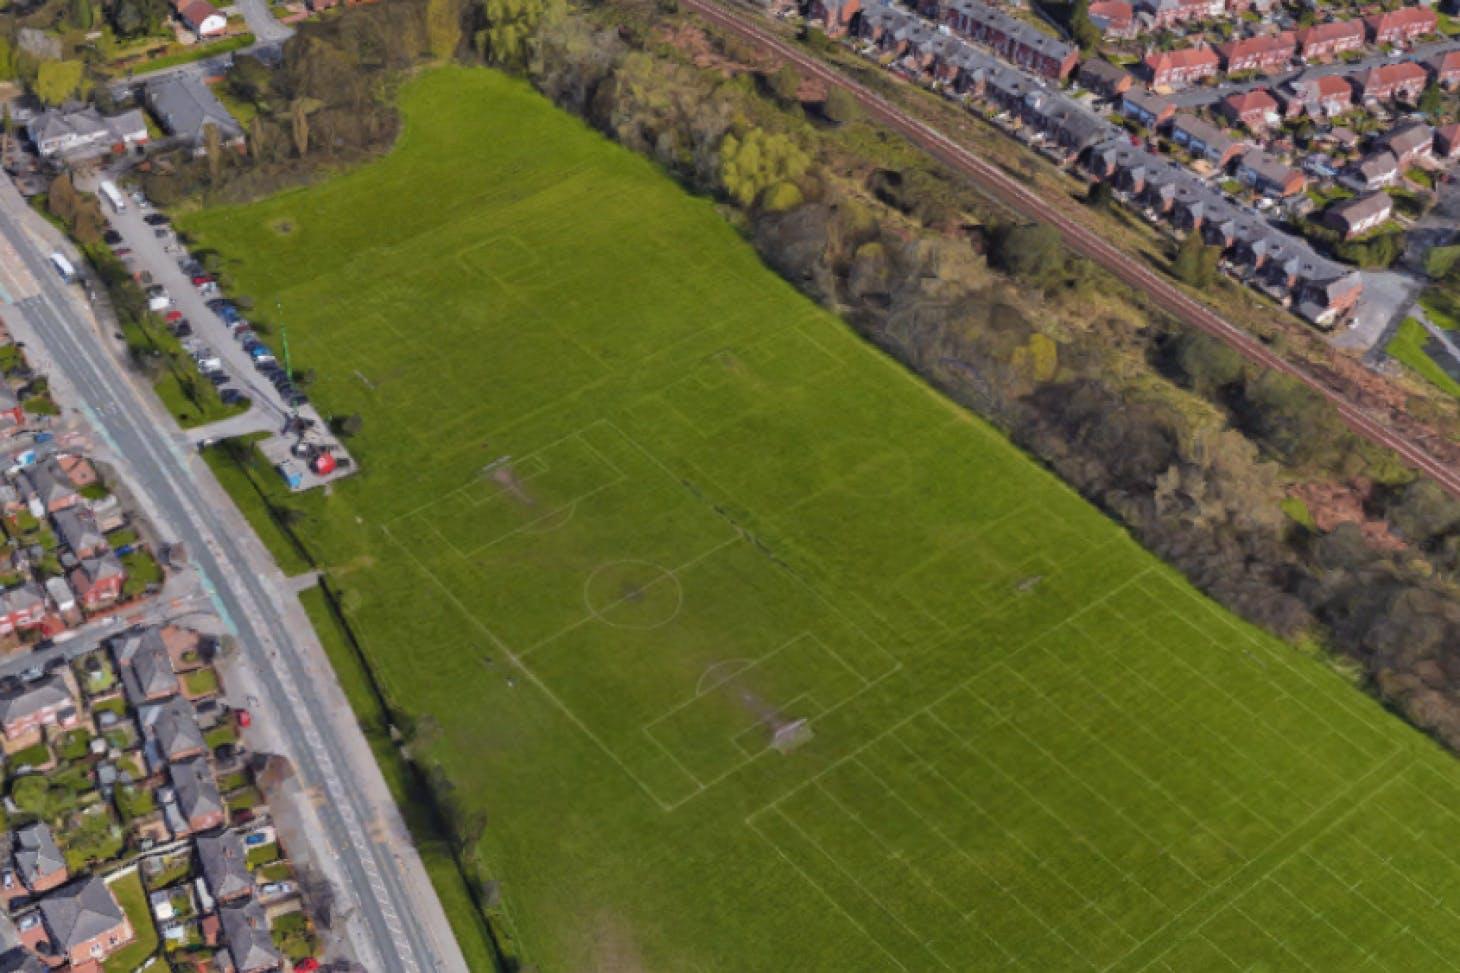 Rabbit Hills Playing Fields 11 a side | Grass football pitch